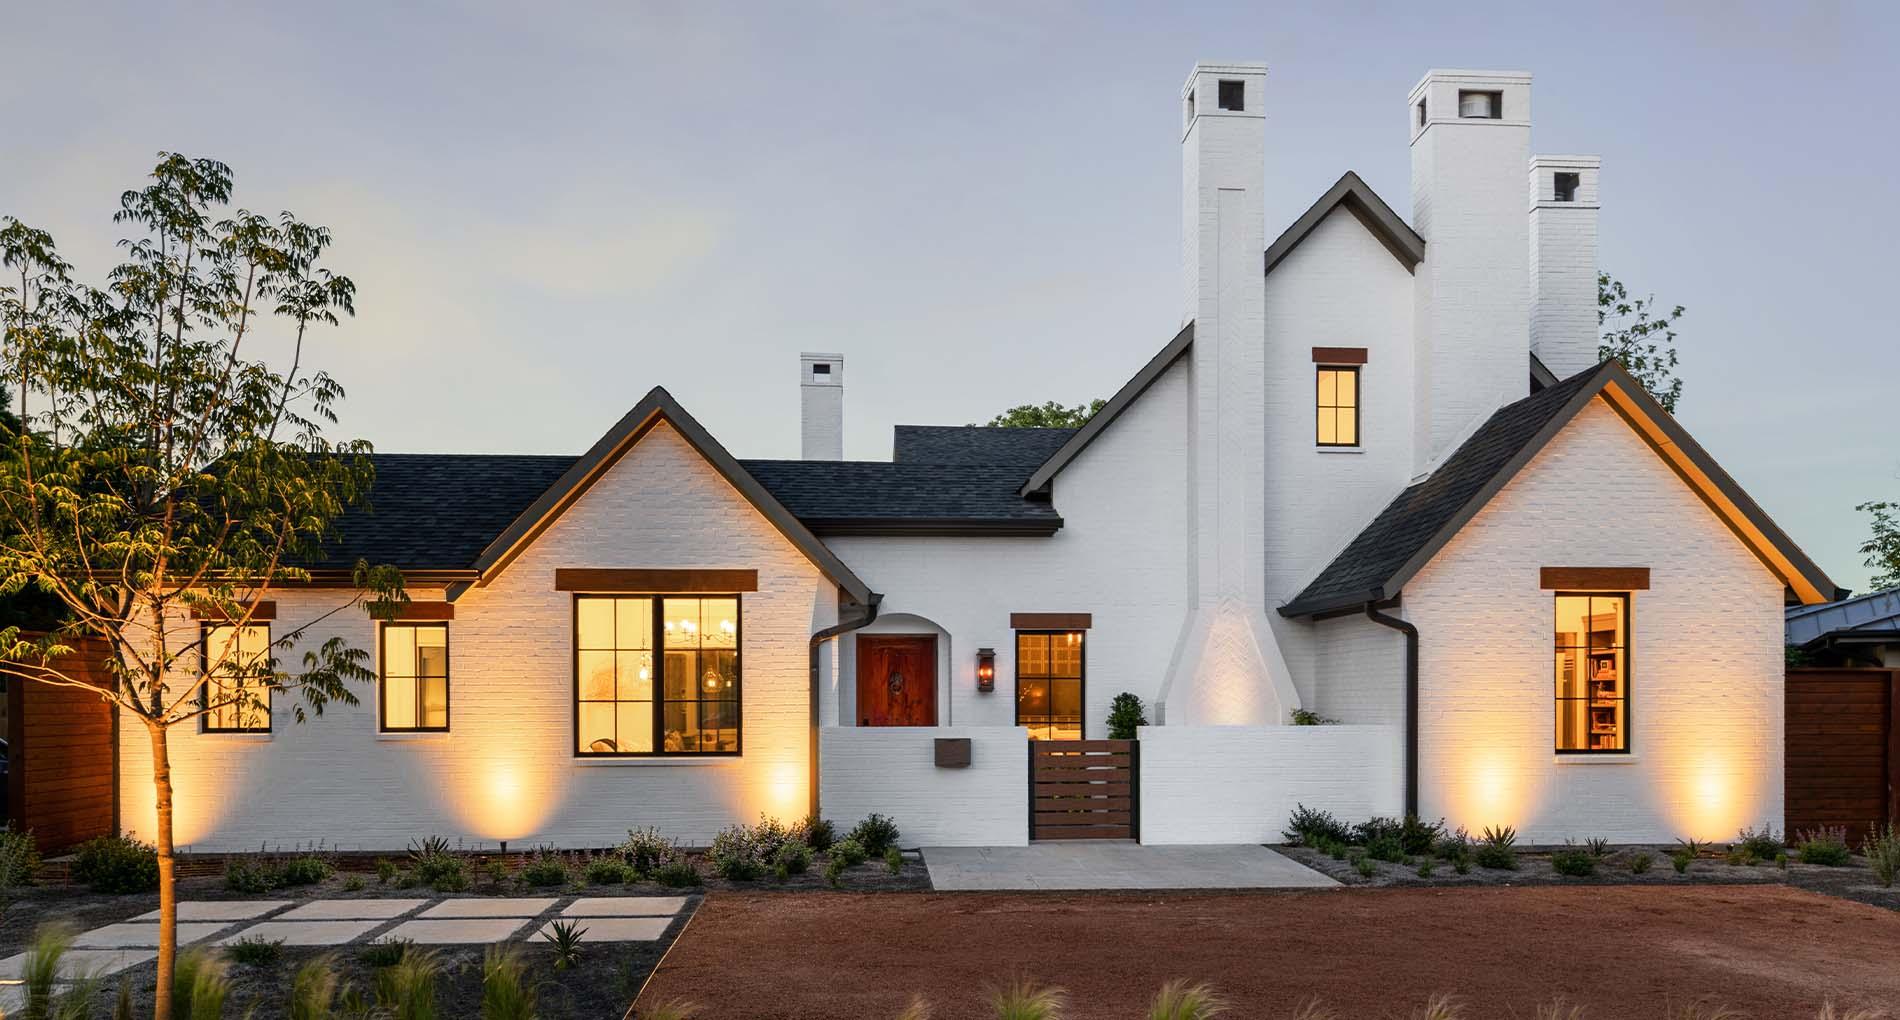 preston-hollow-tumbleweed-custom-home-plano-feature-image